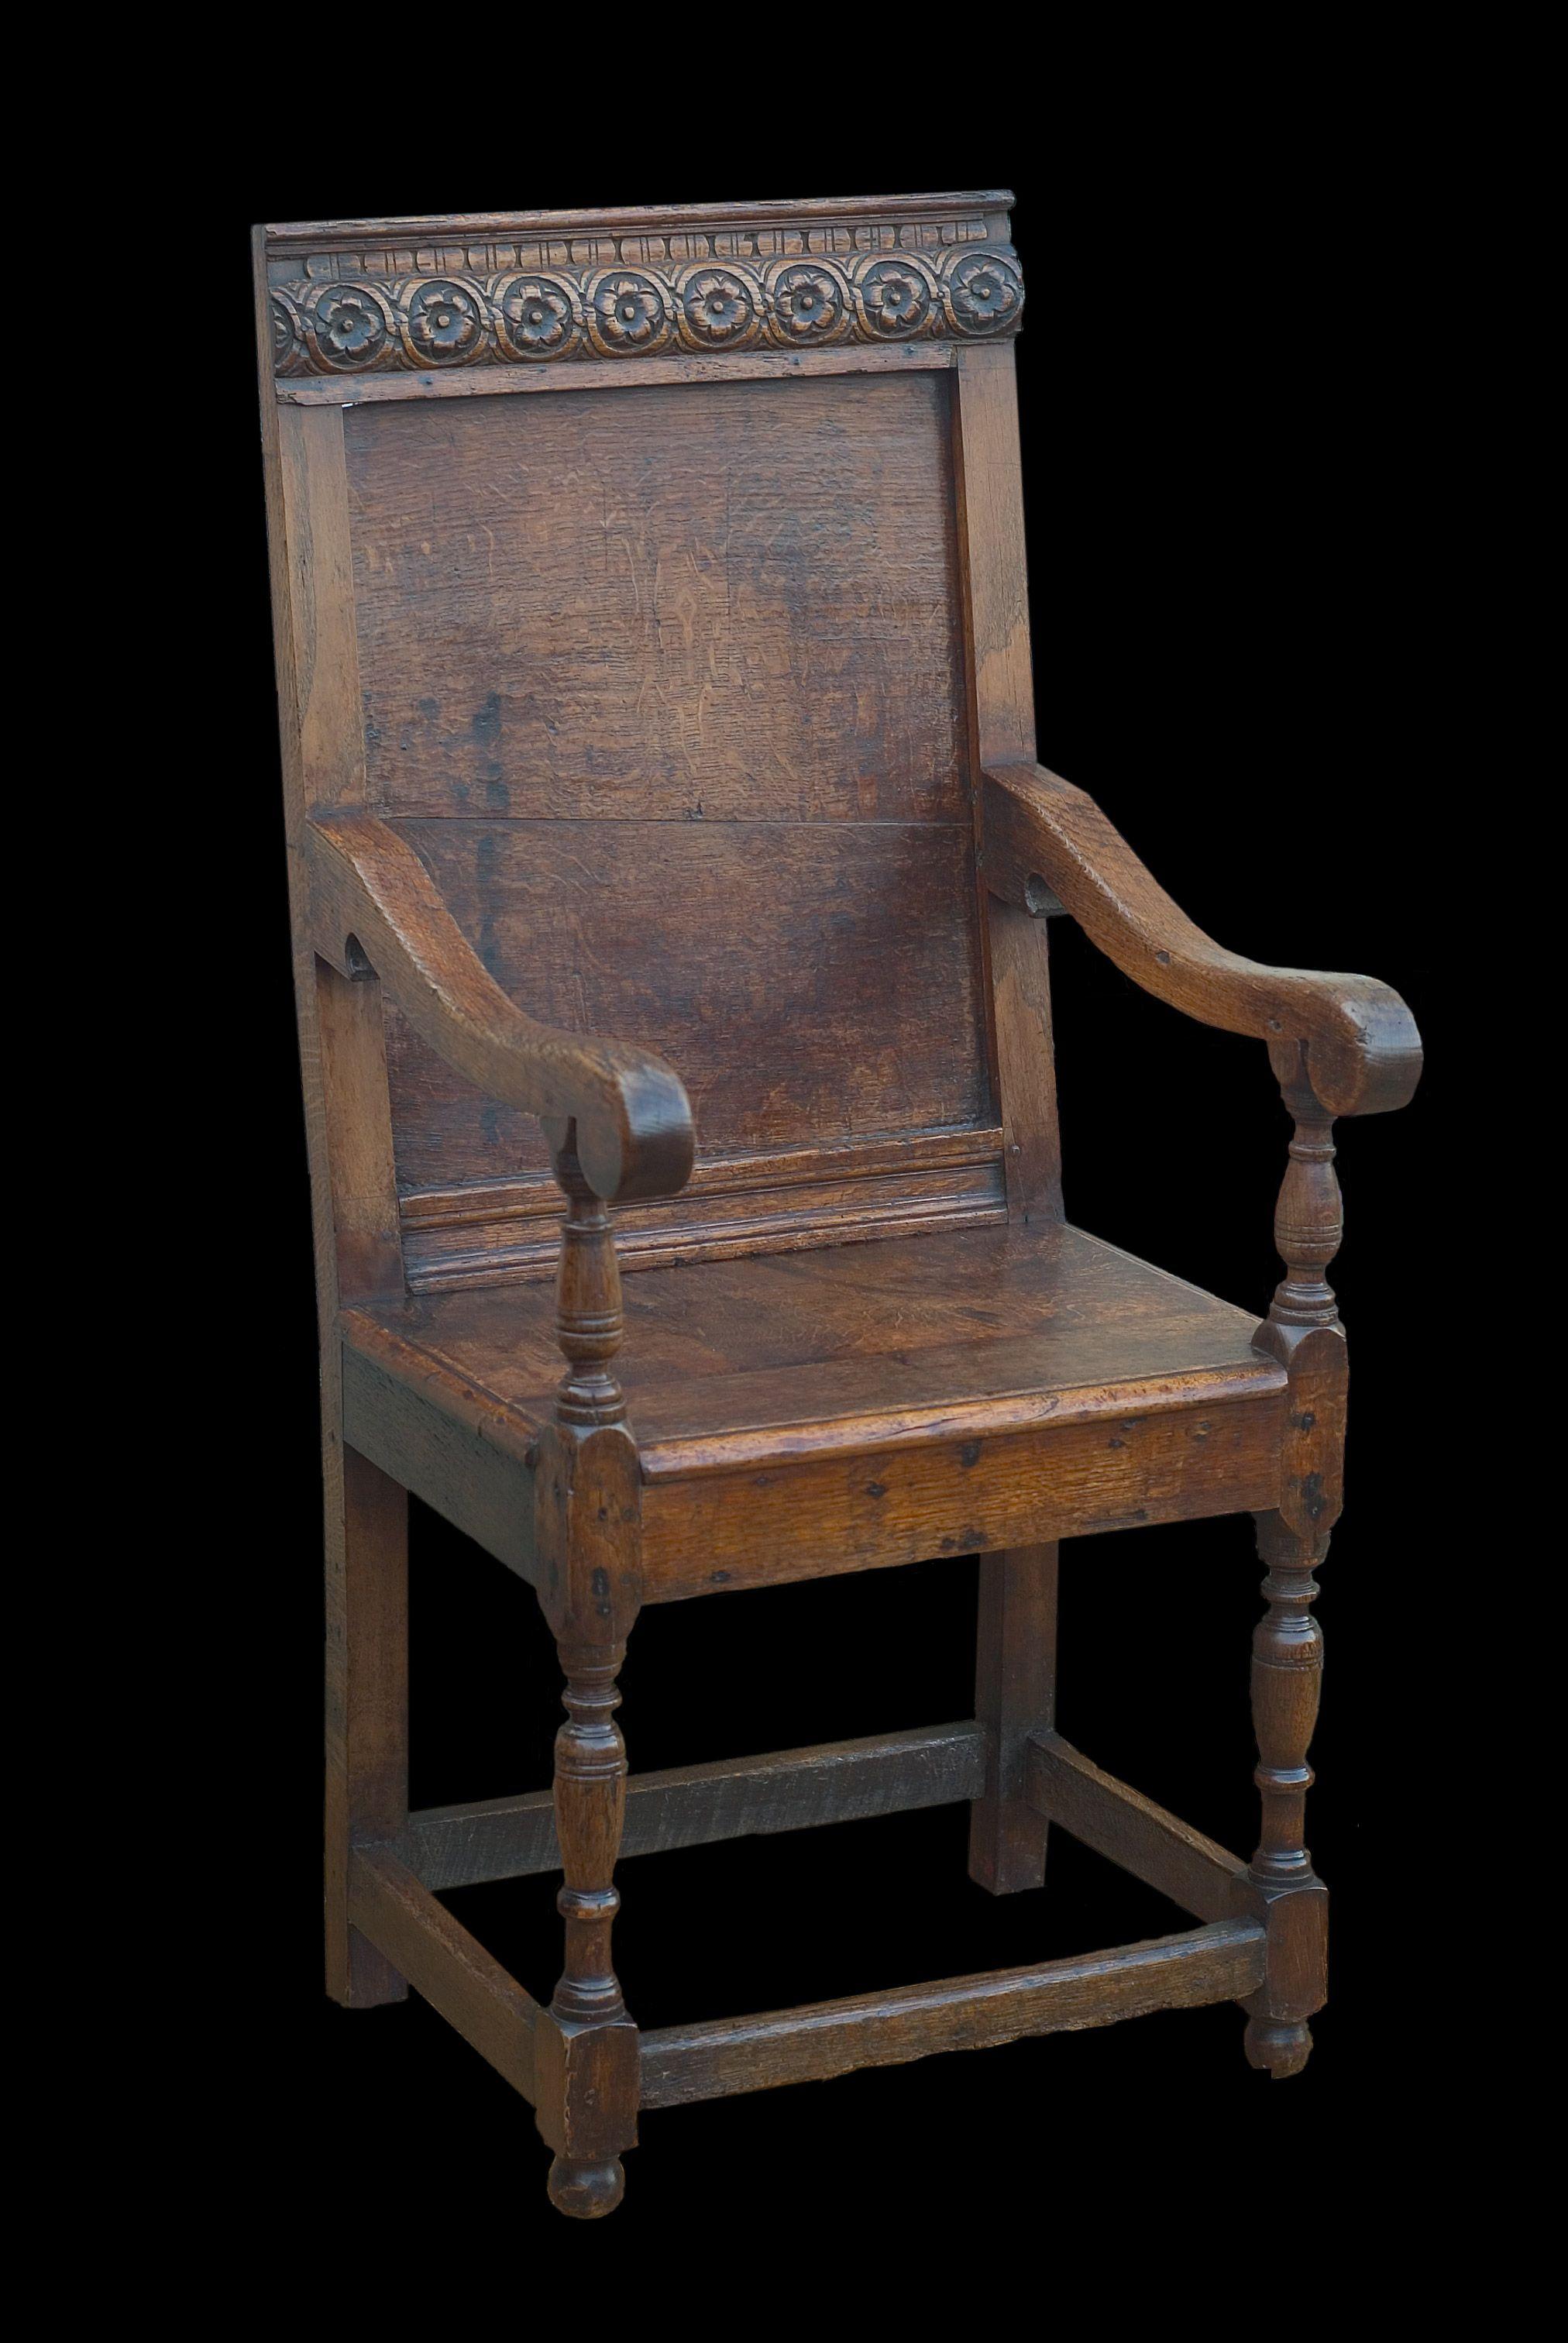 40 Idees De Furniture Xiii Xviith C Mobilier De Salon Meuble Baroque Mobilier Medieval